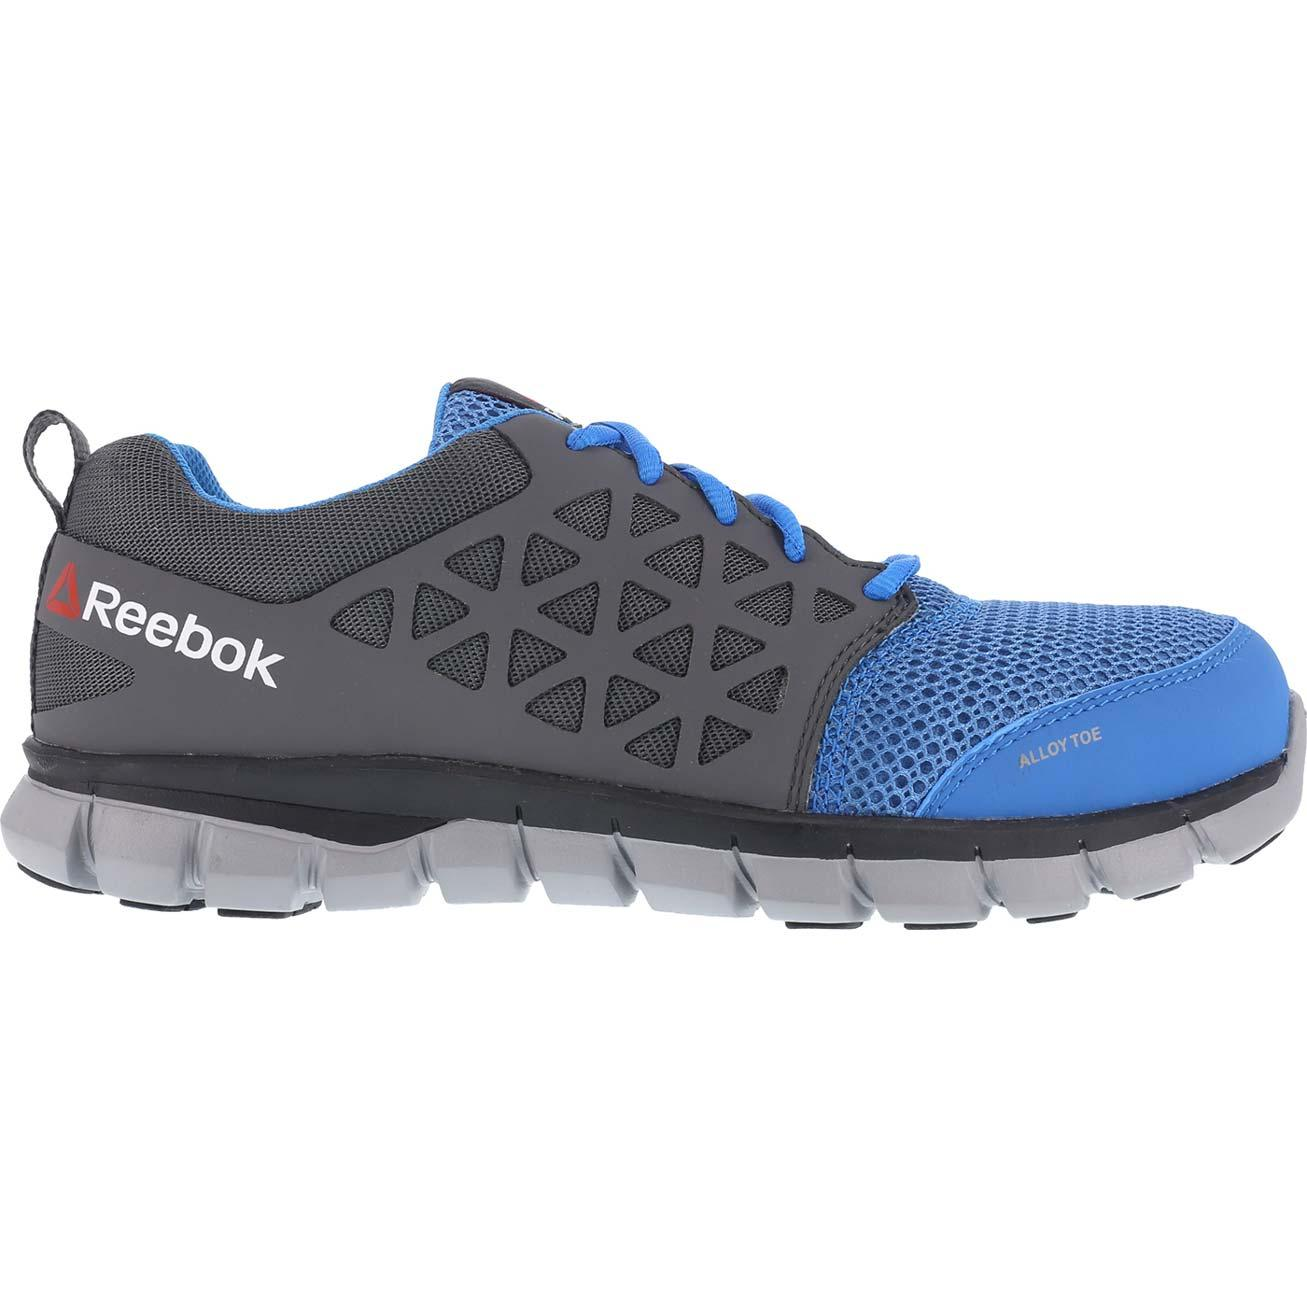 9c12c398e85 Loading zoom. Reebok Sublite Cushion Work Women s Alloy Toe Static-Dissipative  Work Athletic Shoe